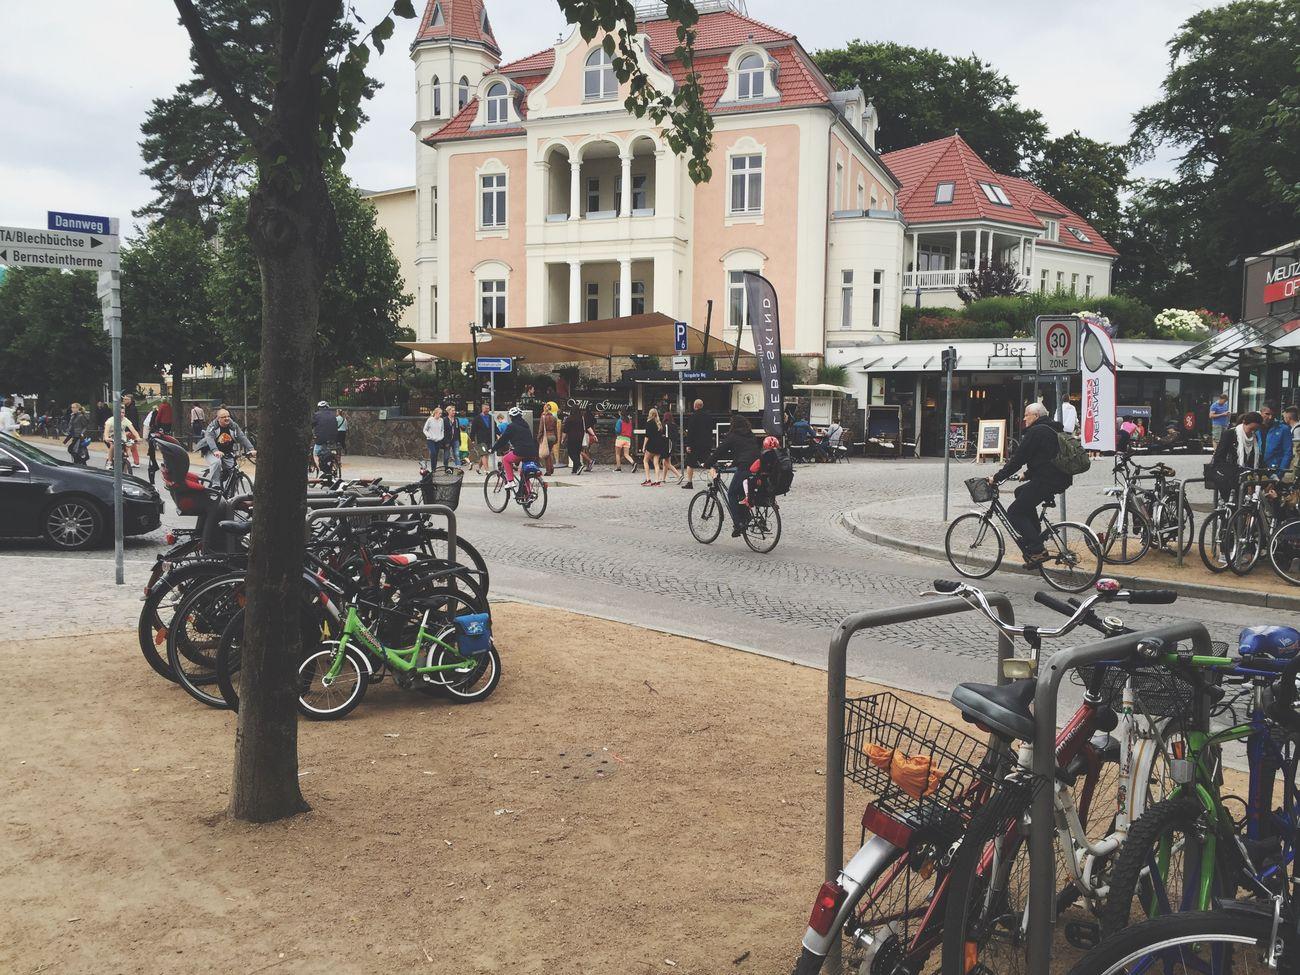 Zinnowitz Ice Cream Summer Ostsee Baltic Sea City